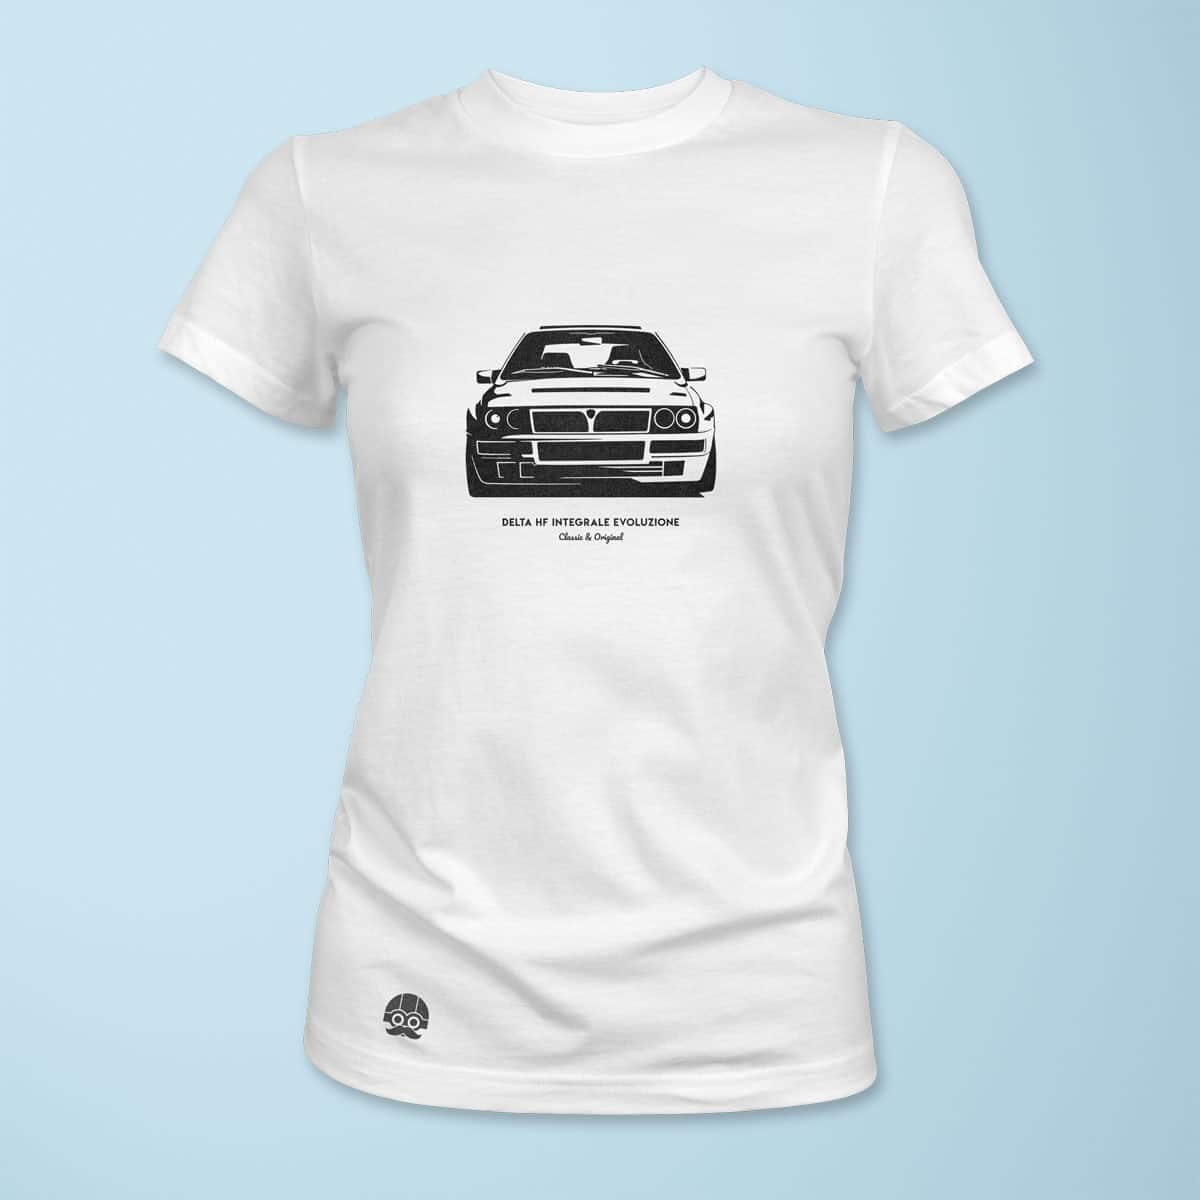 Koszulka damska z Lancia Delta Integrale Evoluzione